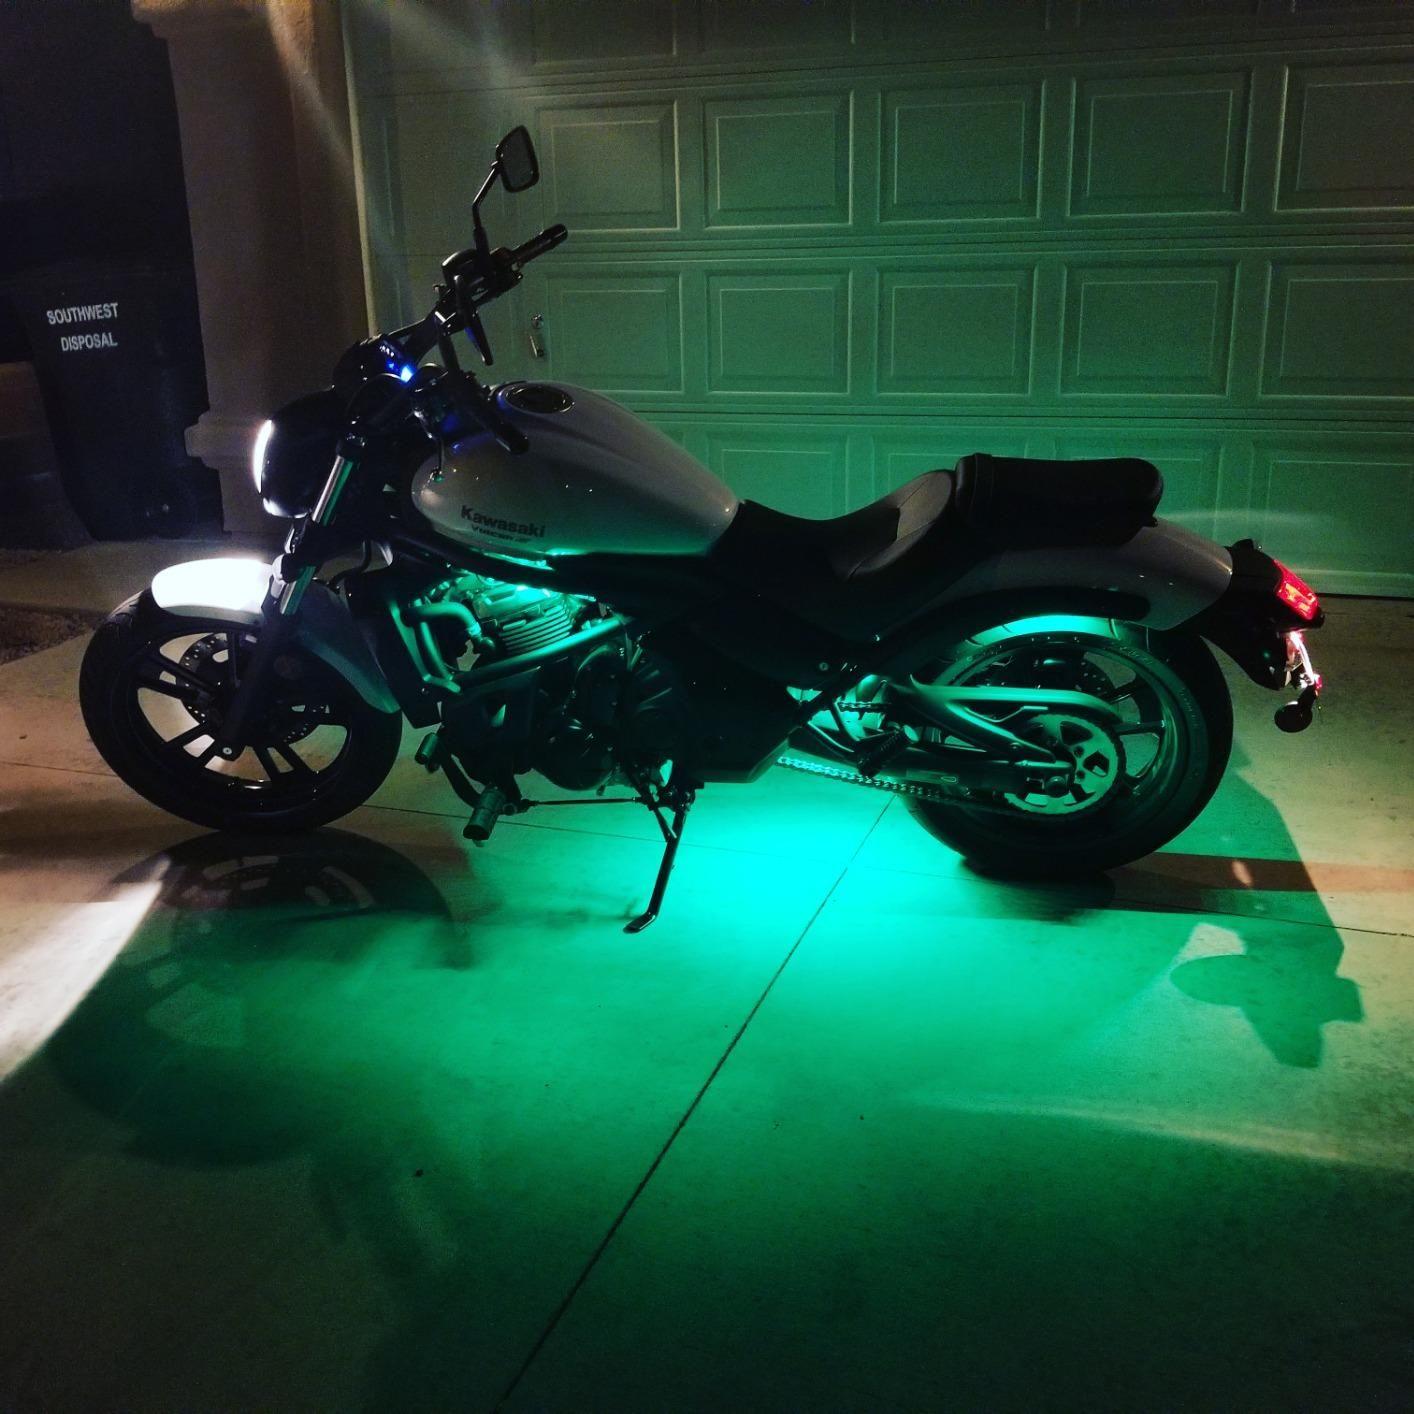 Green Underglow Kawasaki in 2020 Motorcycle led lighting